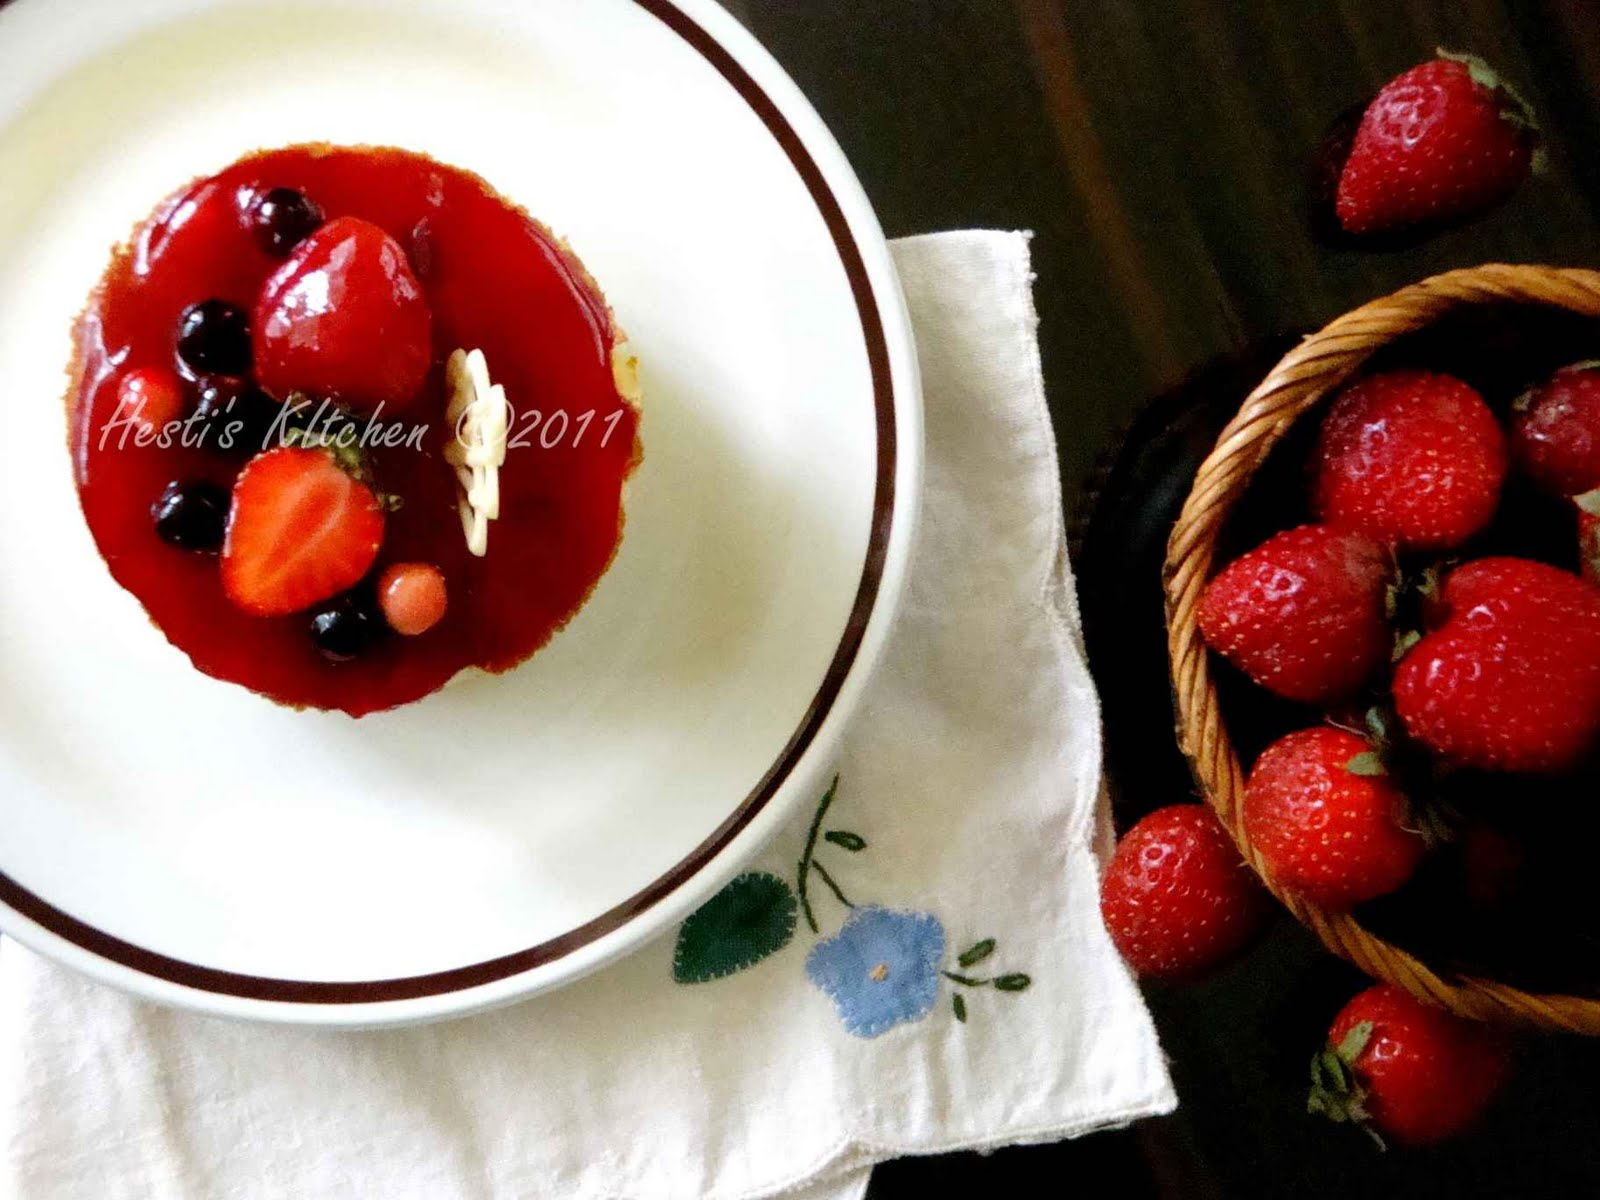 Hestis Kitchen Yummy For Your Tummy Strawberry Cheese Cotton Cake Selai Resepnya Kuambil Dari Majalah Sedap Resep Aslinya Tiramisu Terdiri Dua Lapis Keju Dan Kopi Tapi Aku Cuman Pake Cheesenya Aja